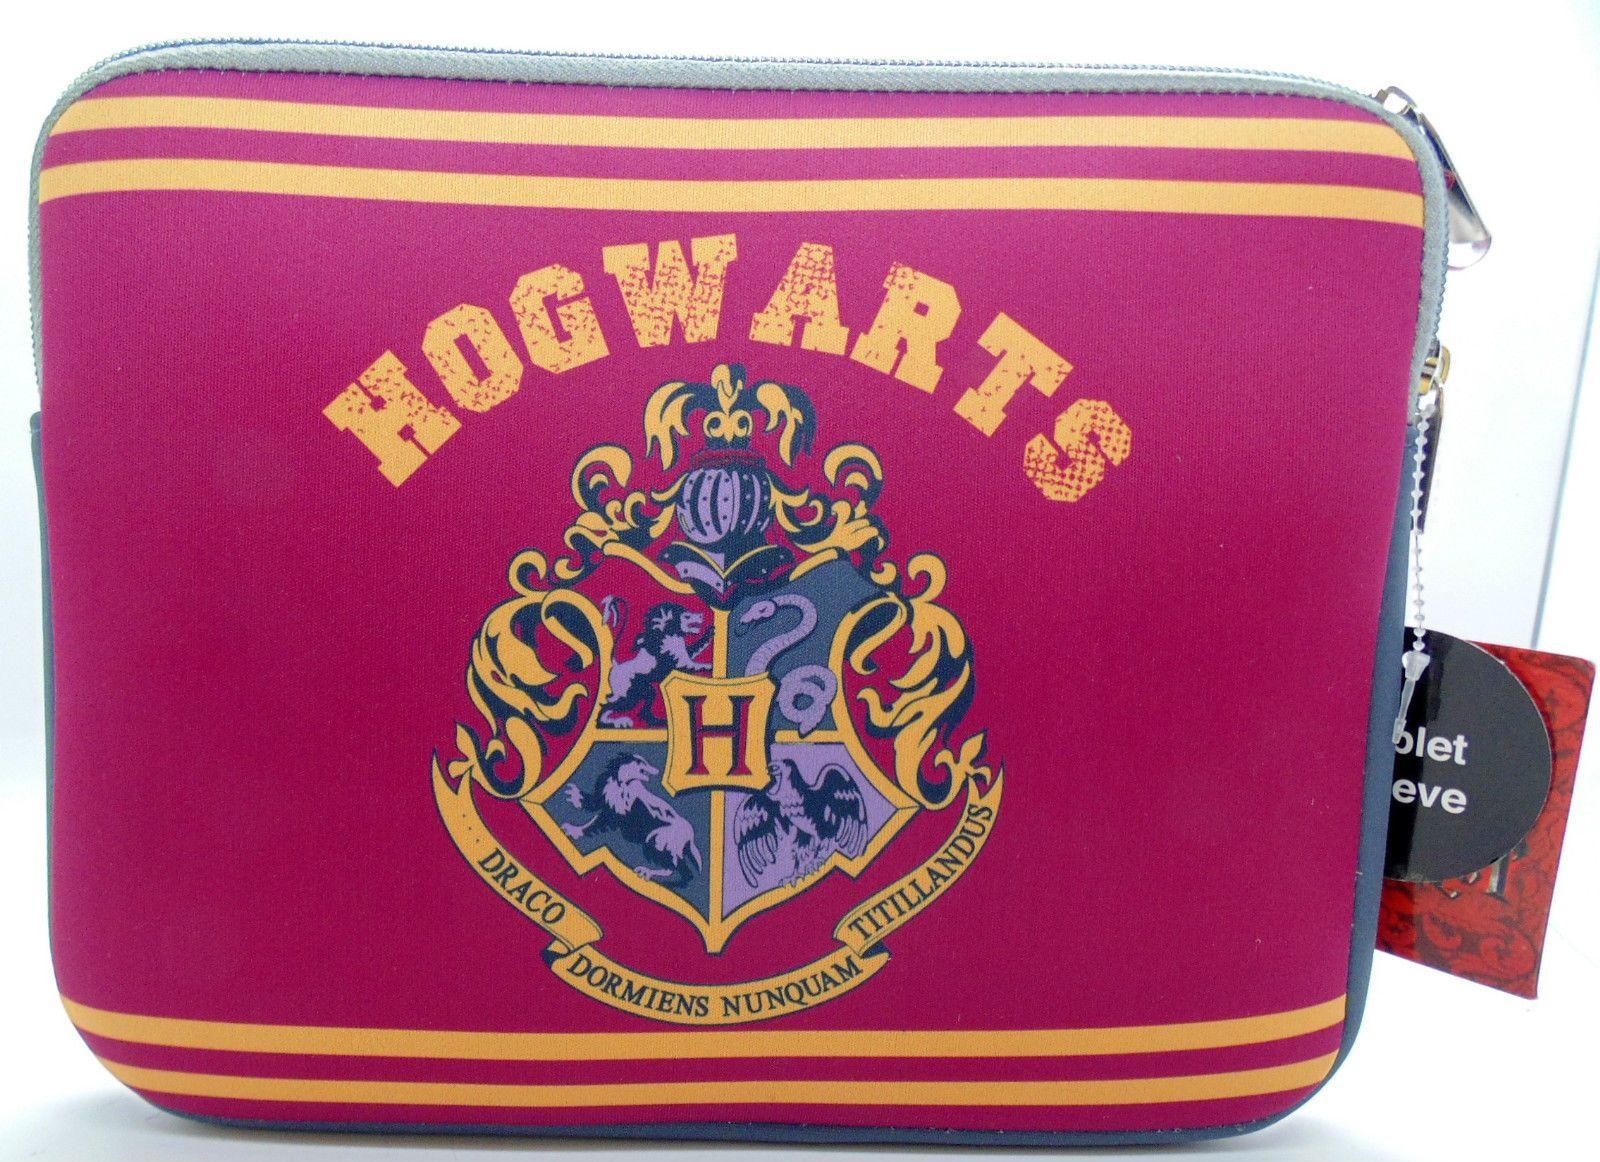 New Primark Harry Potter Hogwarts Apple Samsung Amazon Case Cover Tablet Sleeve Harry Potter Hogwarts Tablet Sleeve Harry Potter